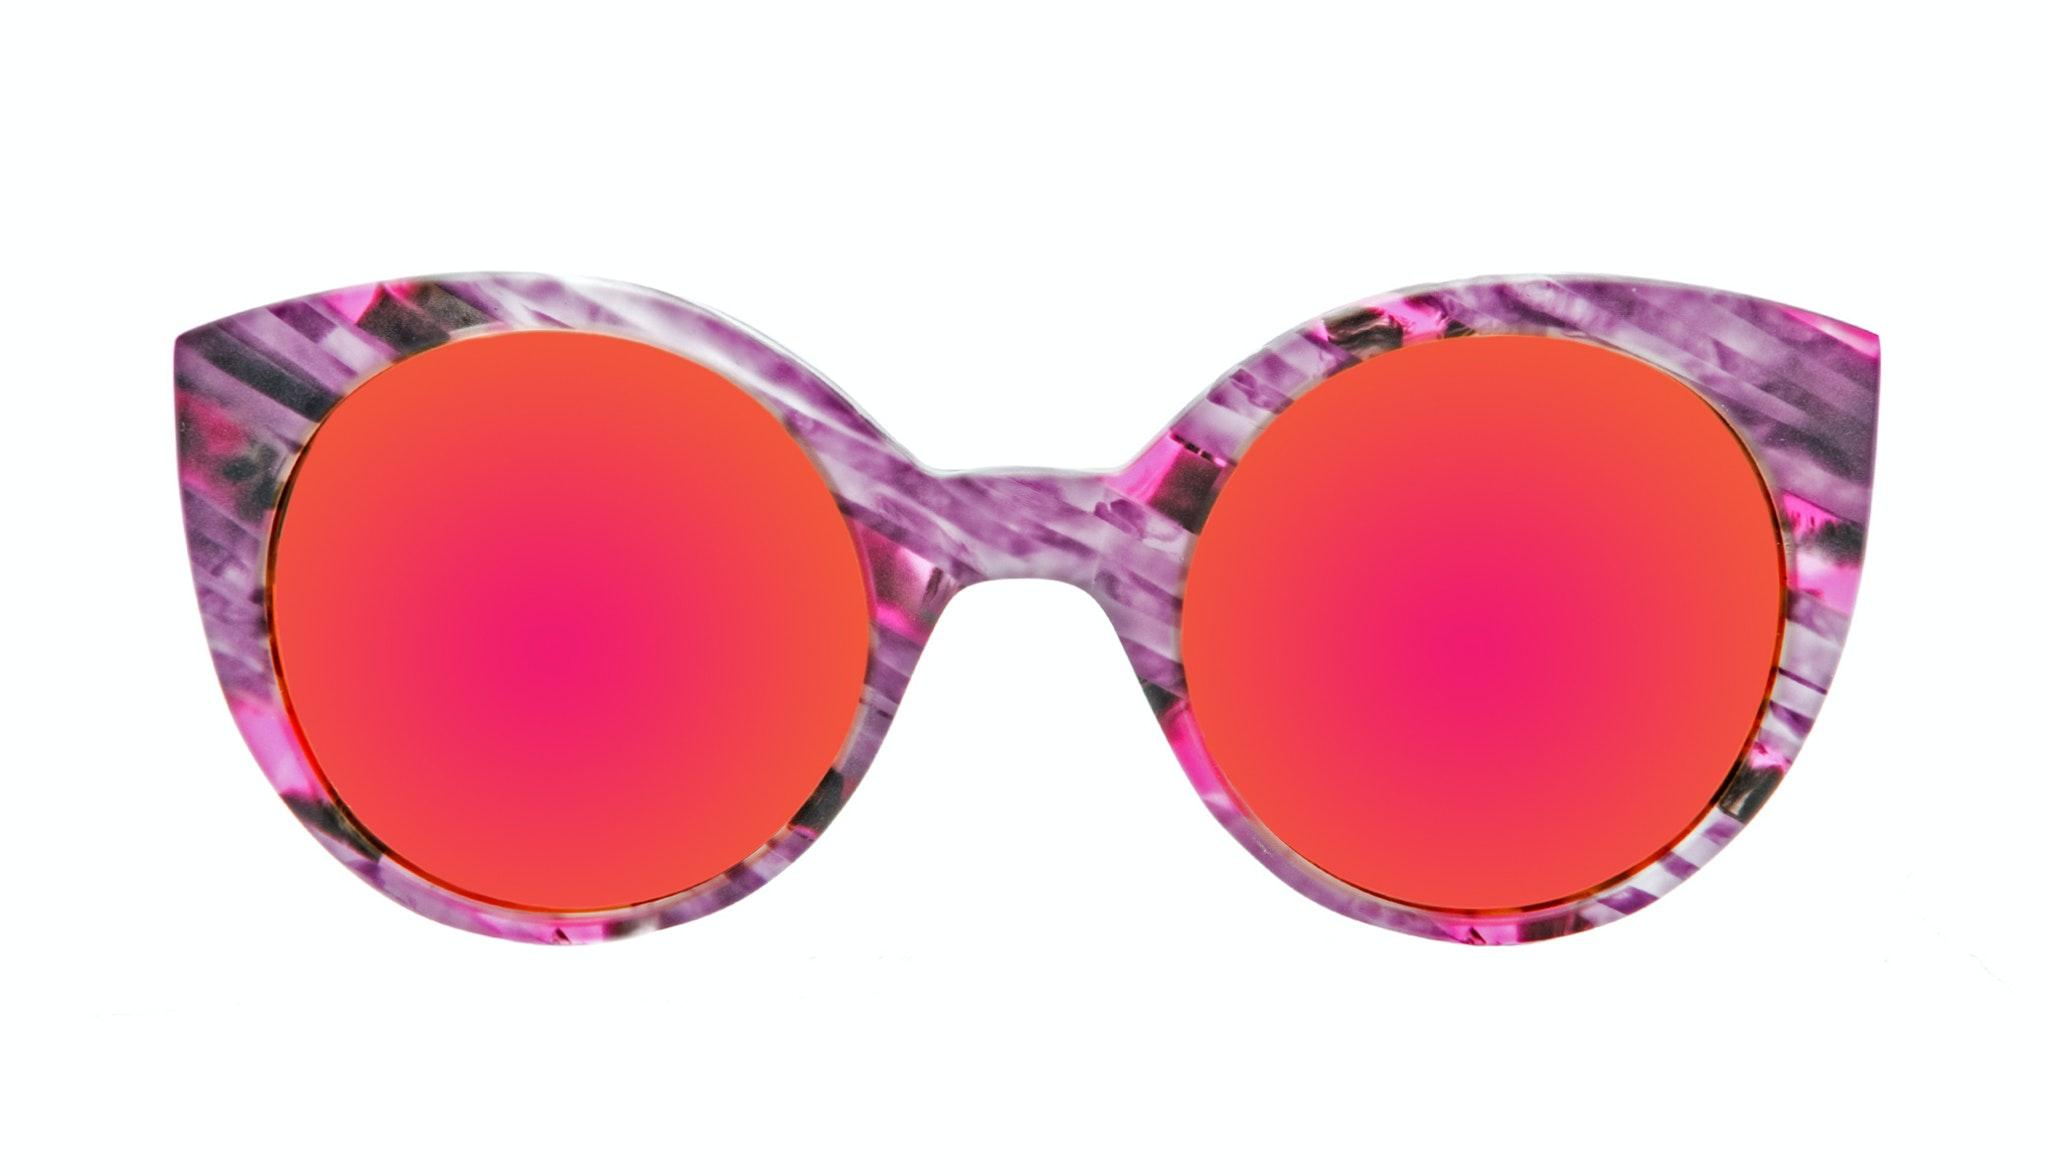 Affordable Fashion Glasses Cat Eye Round Sunglasses Women Eyecandy Pink stripes